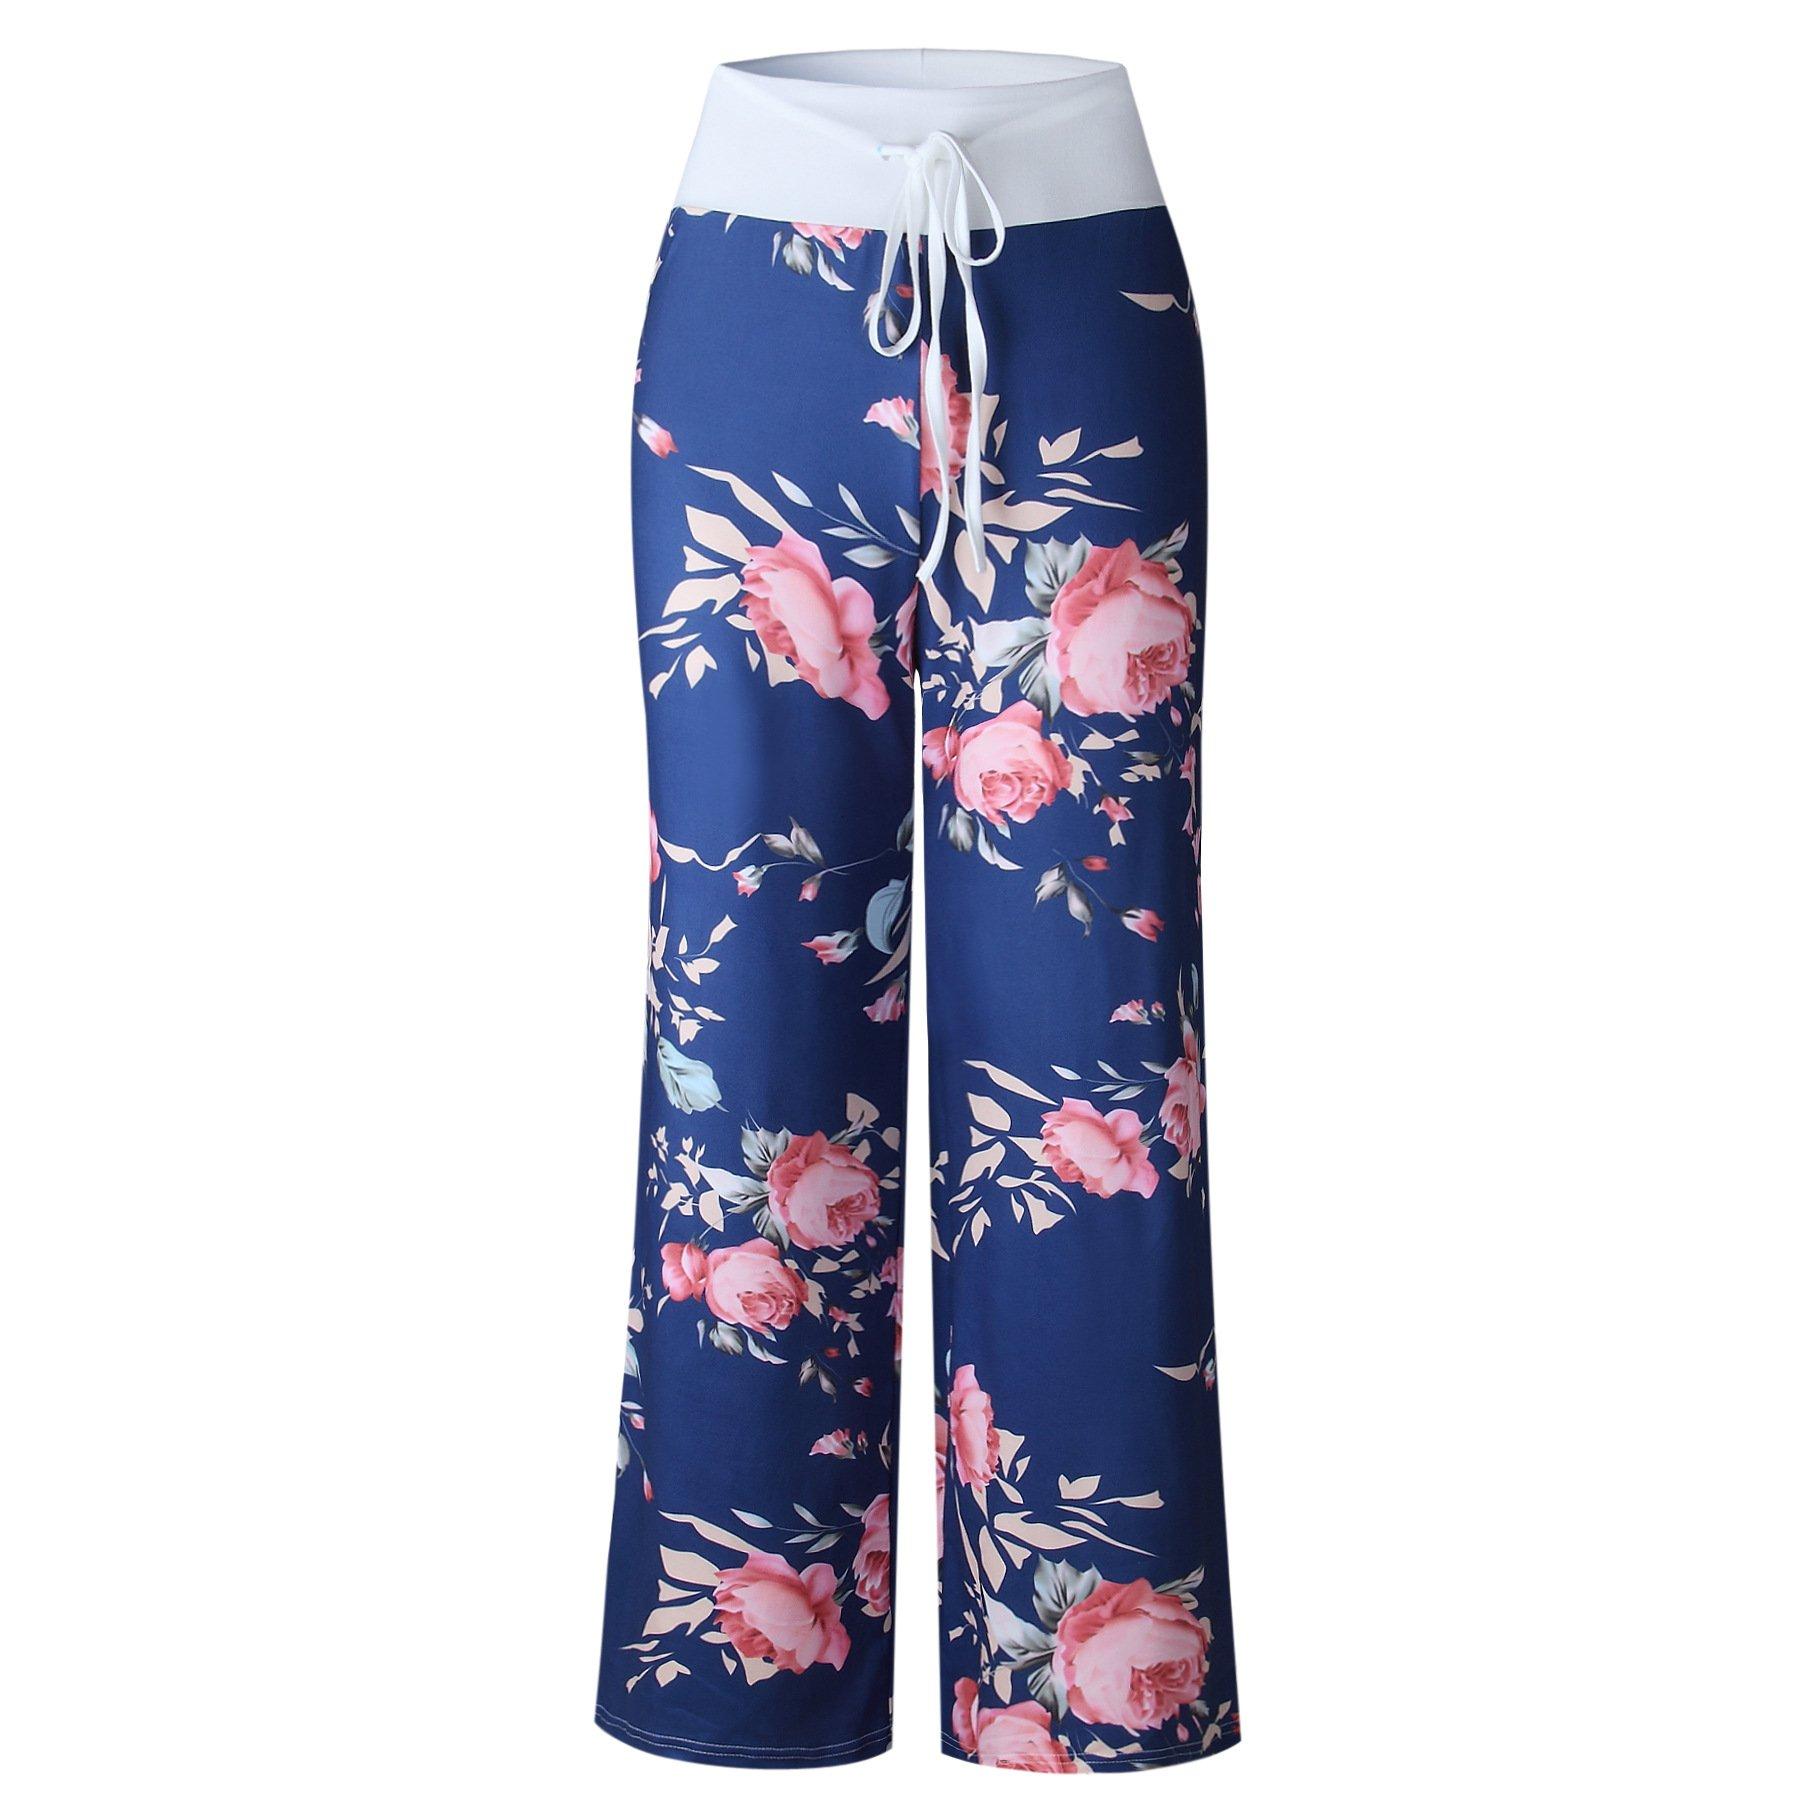 iChunhua Women's Comfy Stretch Floral Print Drawstring Palazzo Wide Leg Lounge Pants(M,Blue) by iChunhua (Image #3)